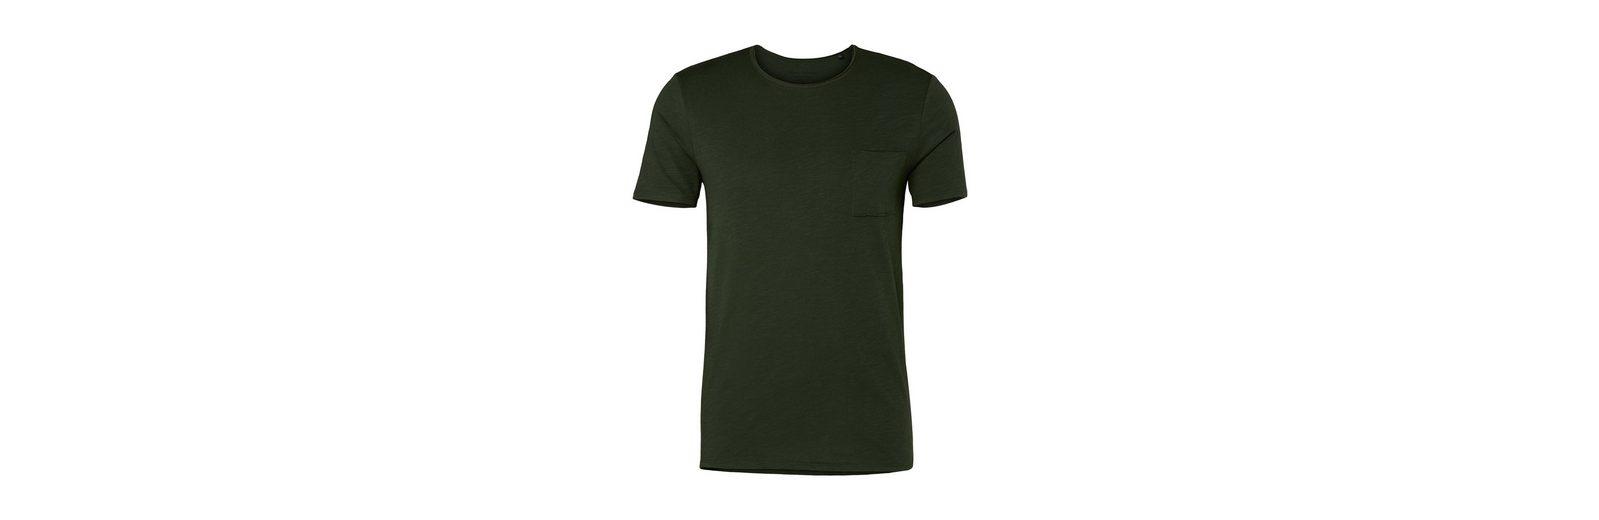 Marc O'Polo T-Shirt Billig Verkaufen Pick Eine Beste nQW7XPnbq